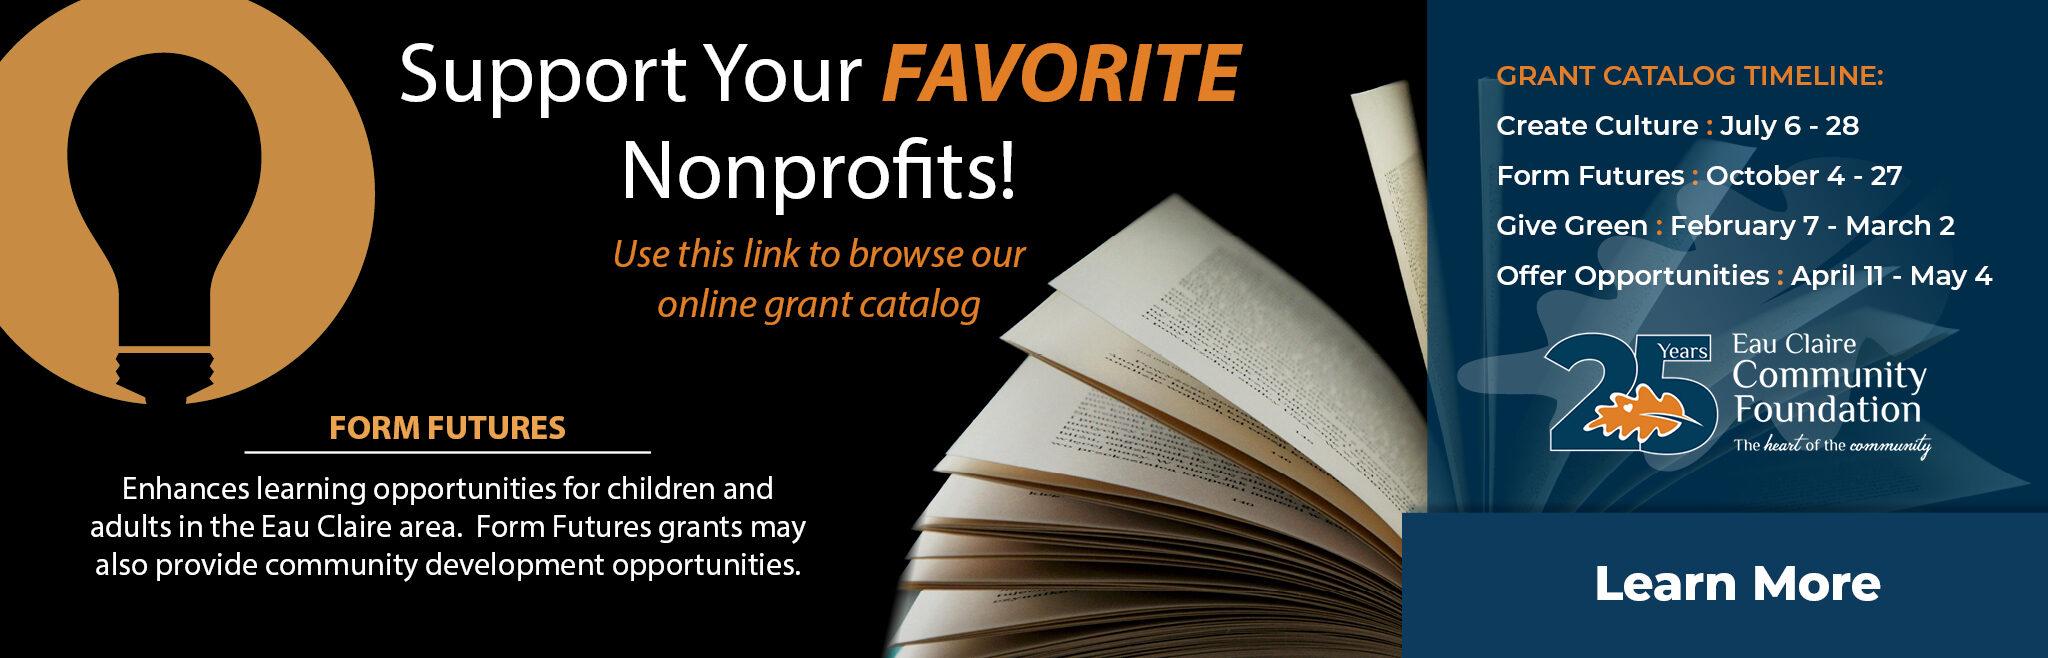 Form Future Grant Catalog is Open